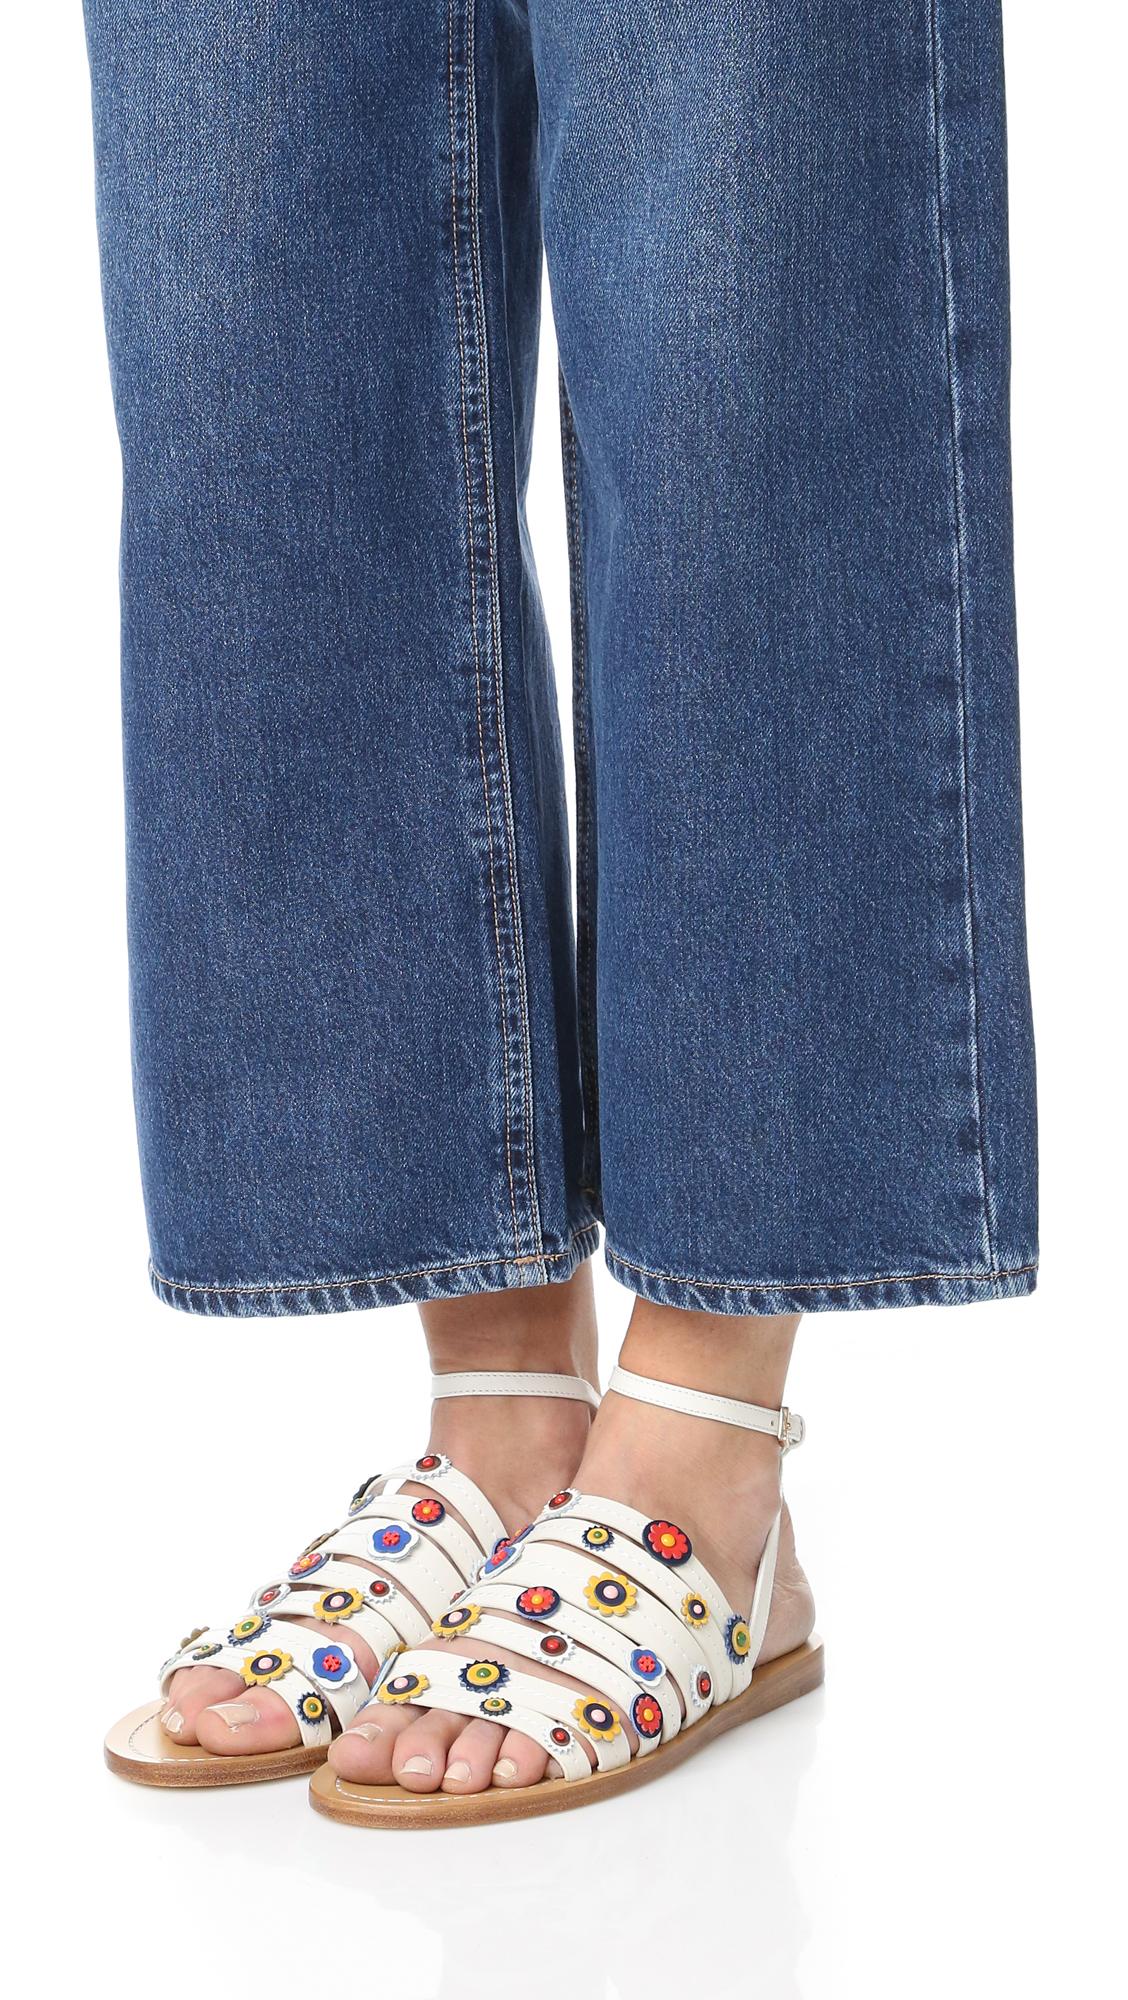 a99bd2b07625 Tory Burch Marguerite Flat Sandals